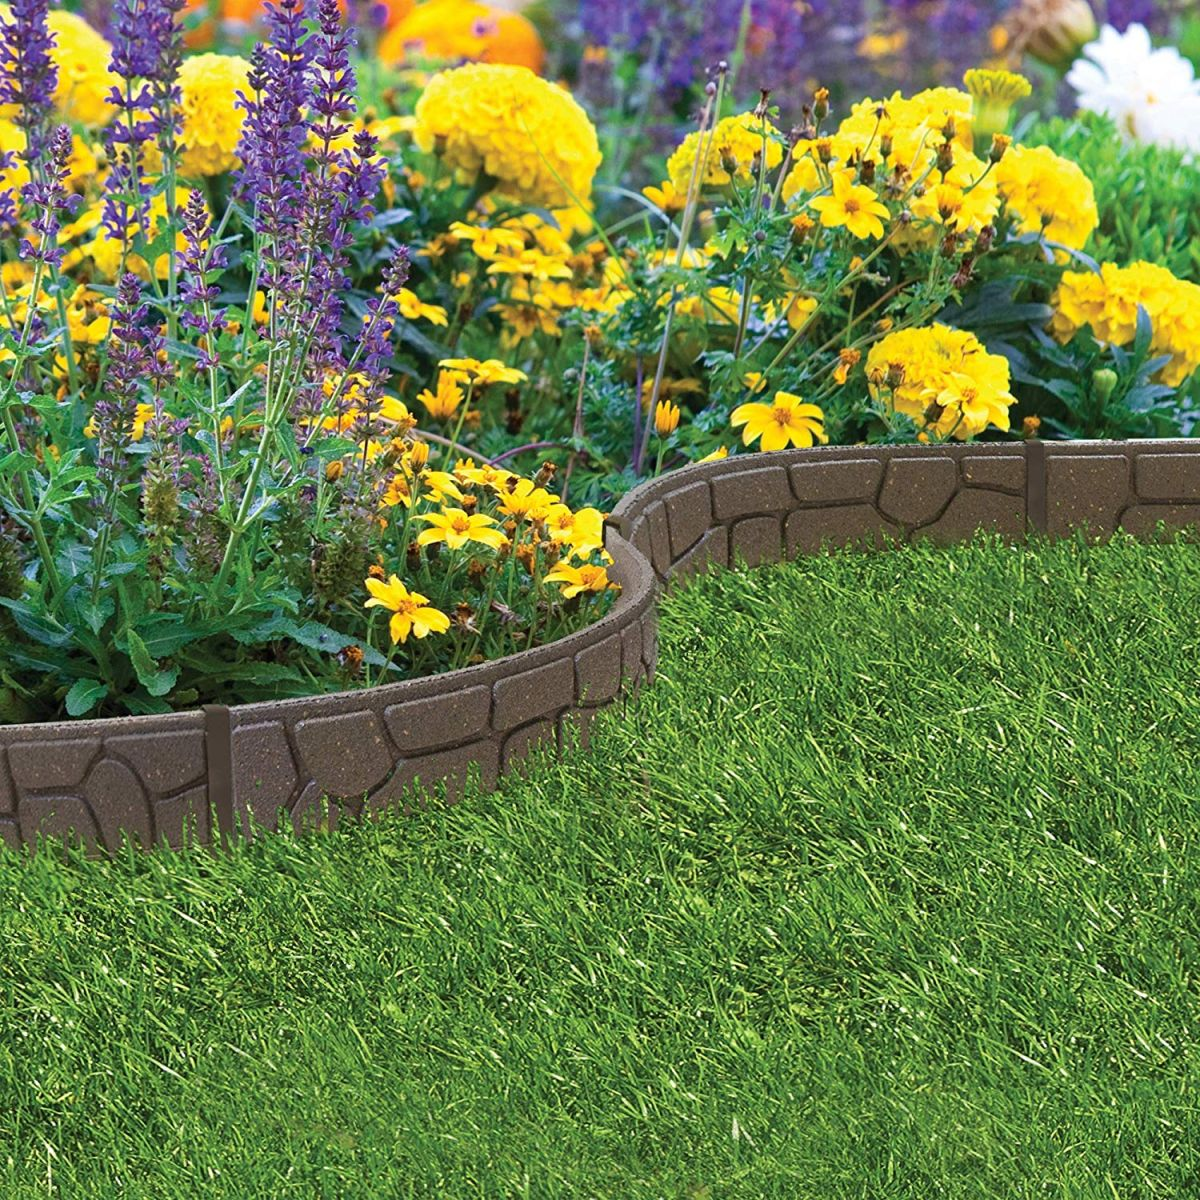 Cheap garden ideas: 17 ways to save money on your garden